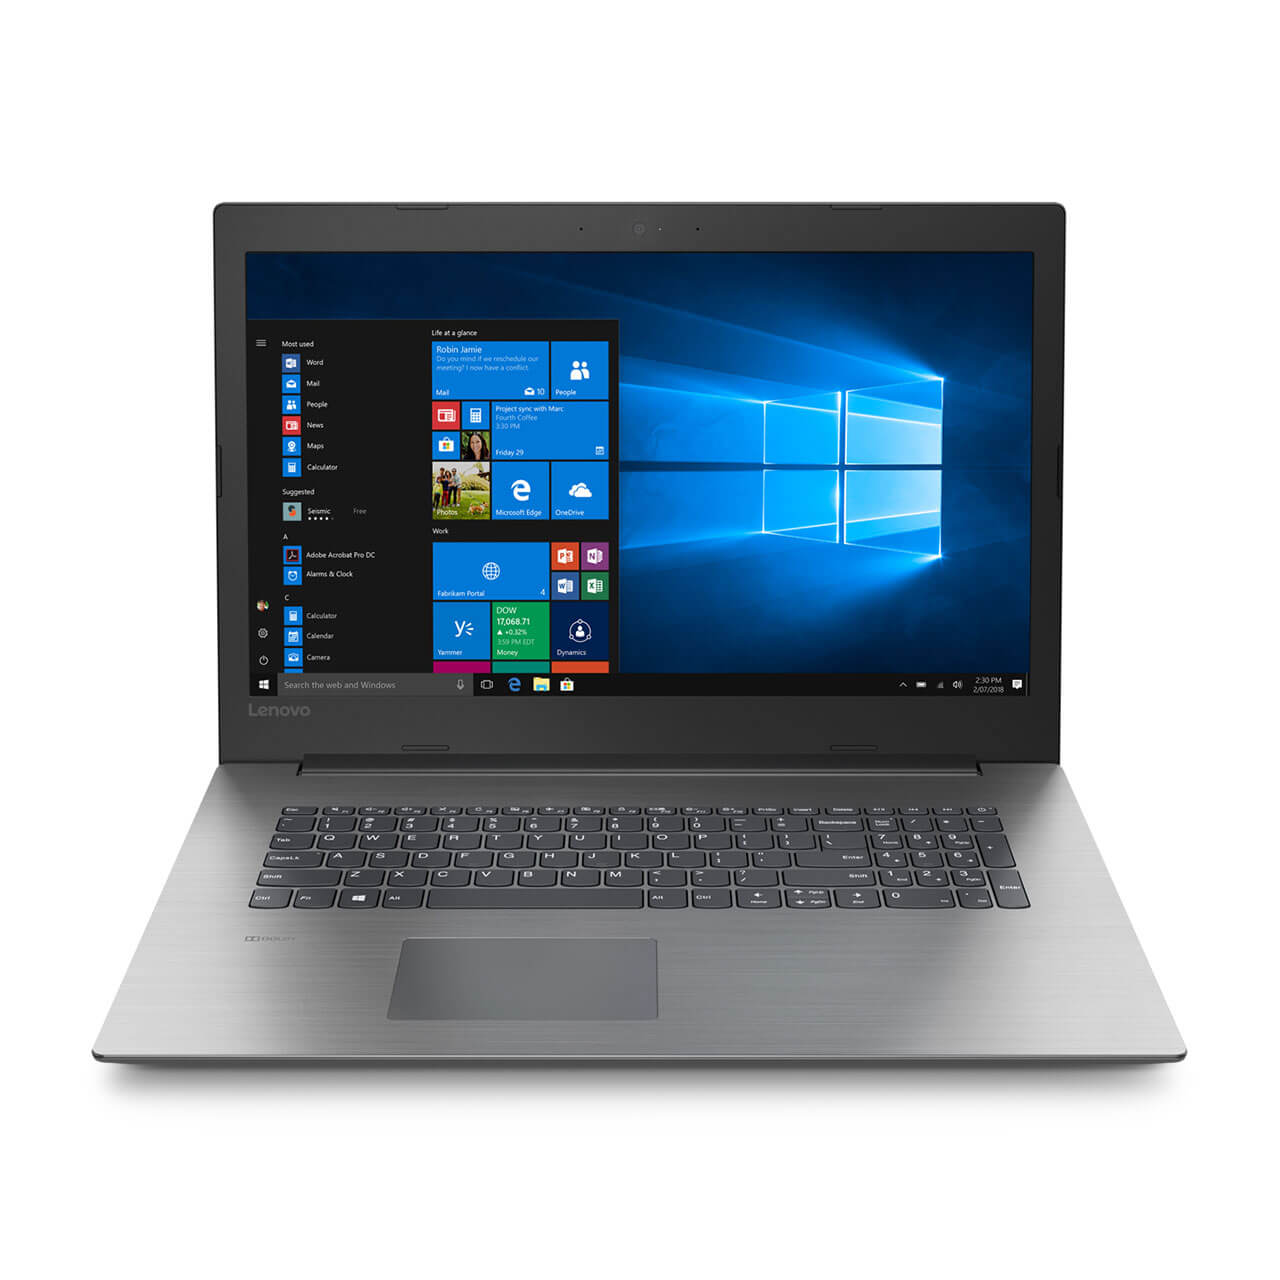 "Lenovo Ideapad 330, 17.3"", i5-8250U, 12 GB RAM, 2TB 5400 RPM, Win 10 Home 64 0"